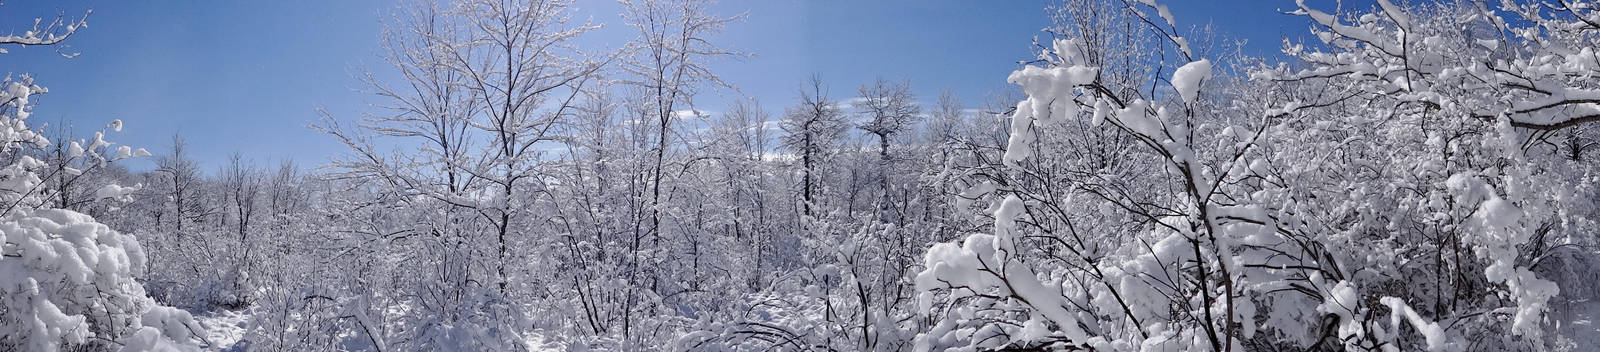 Winter Trees by puppydogbonz